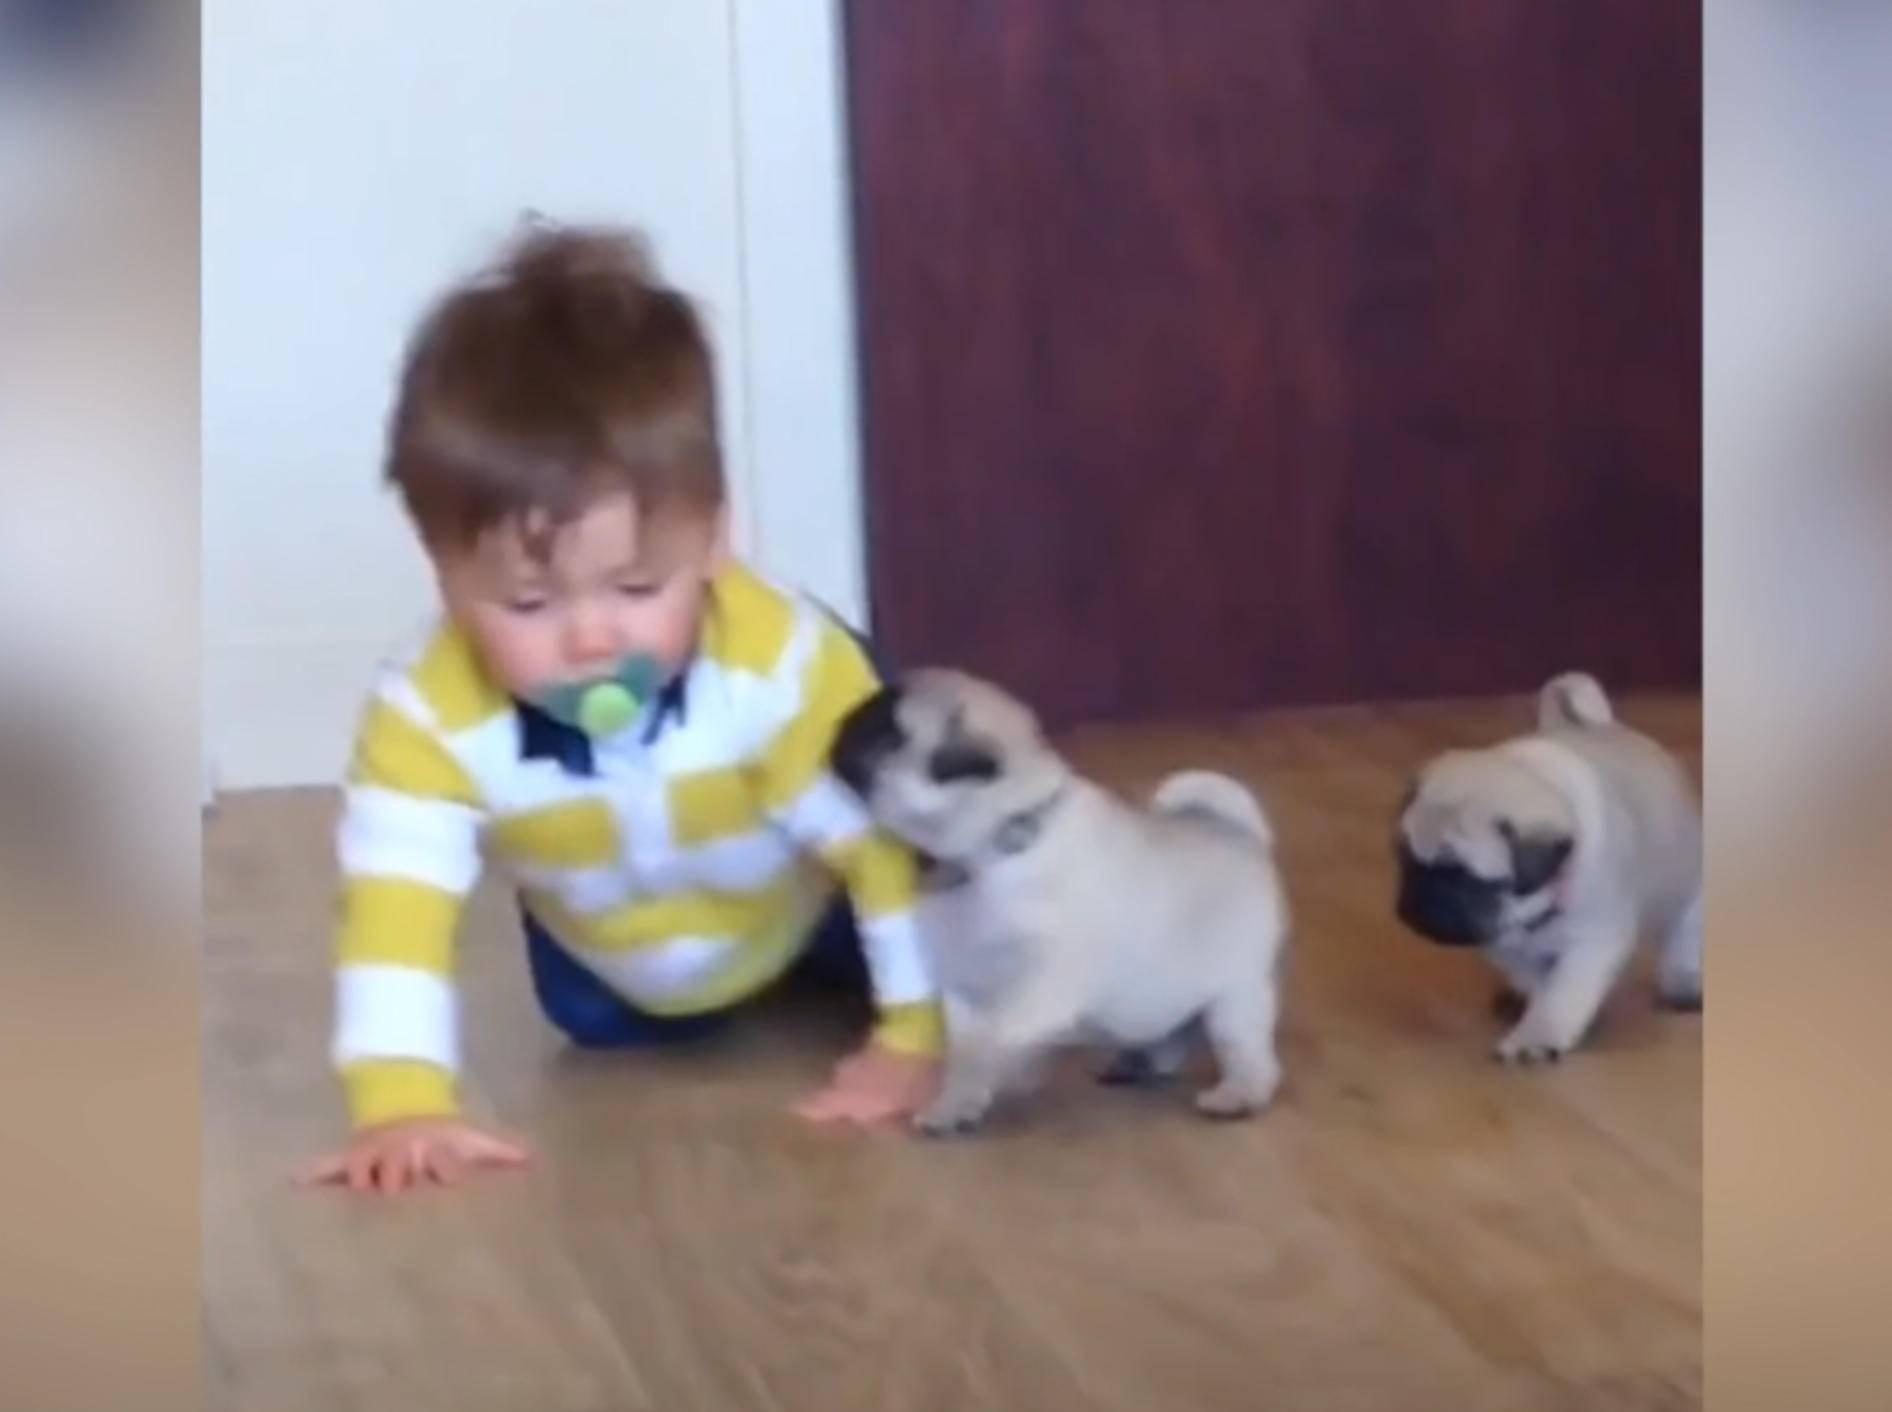 Baby Louie und Mopswelpen sind allerbeste Kumpels – YouTube / ABC Television Stations